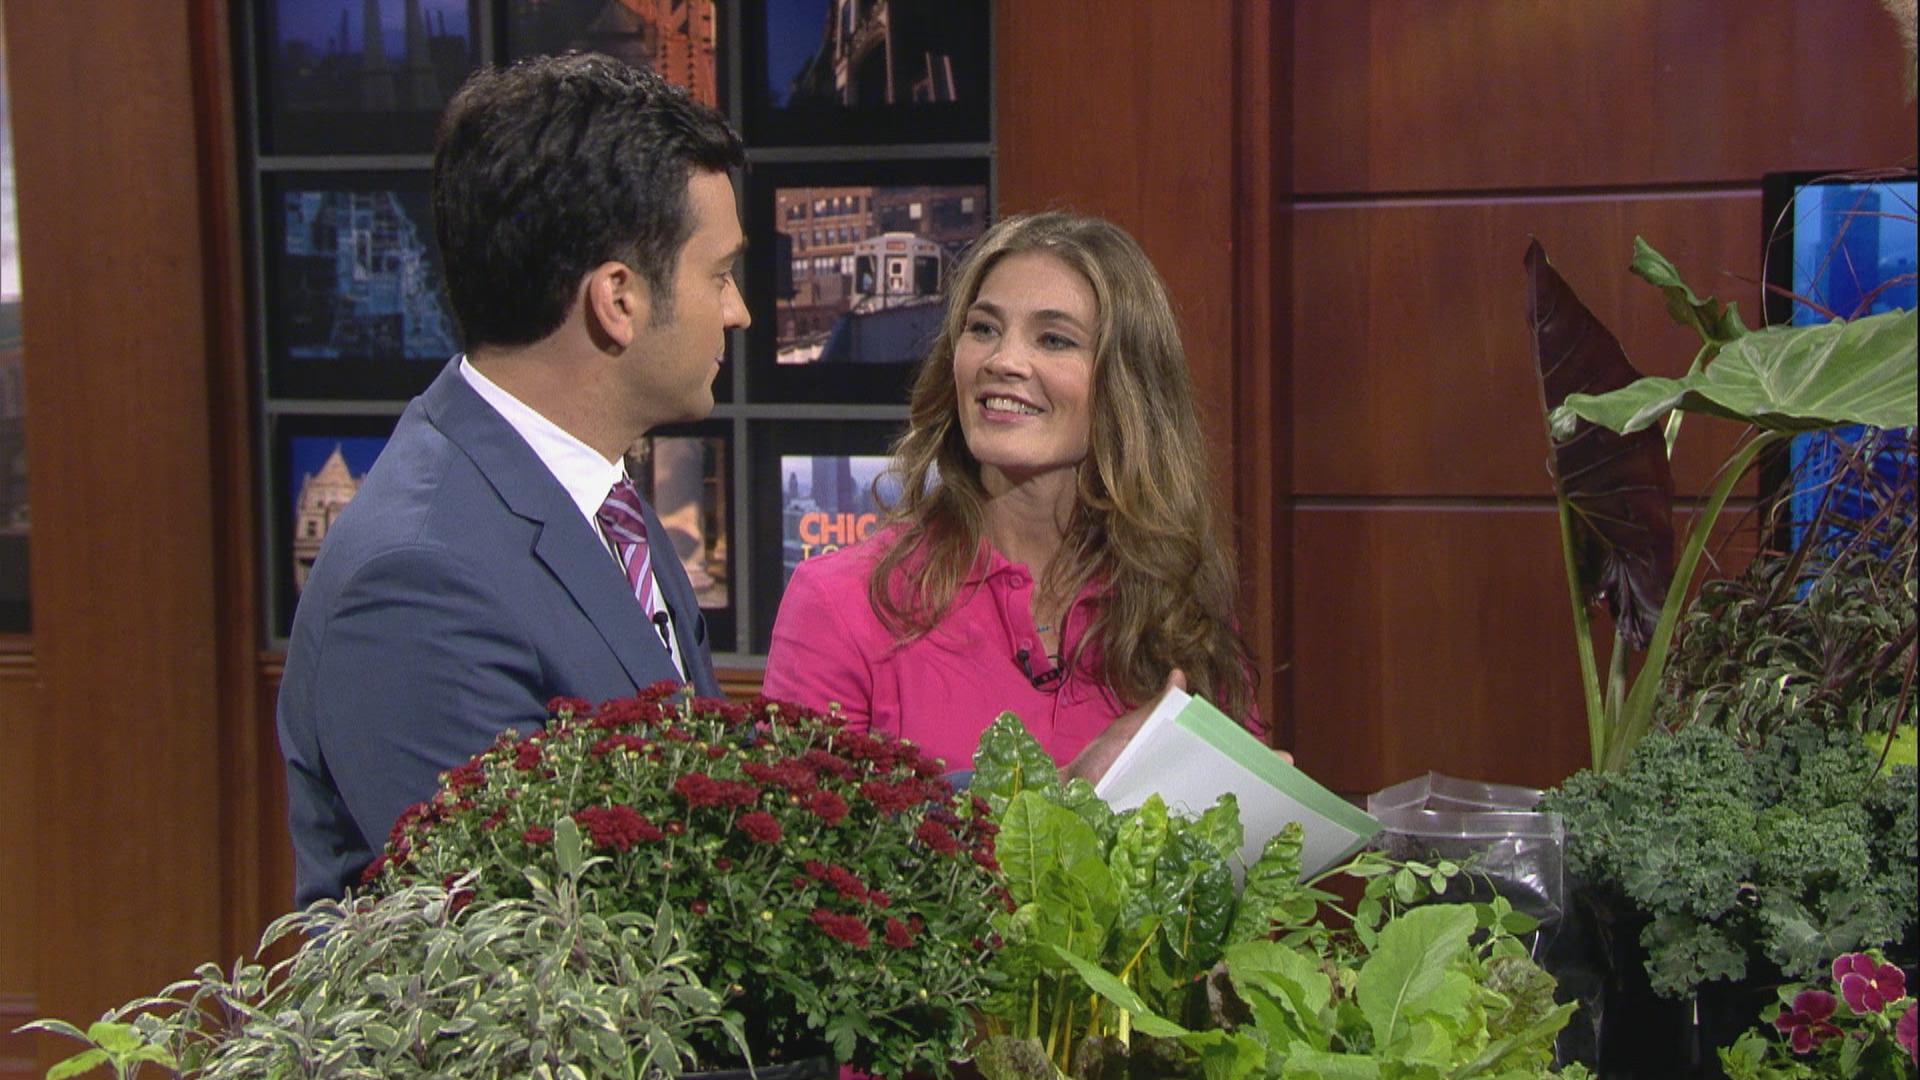 Fall Gardening Tips From Eliza Fournier of the Chicago Botanic Garden